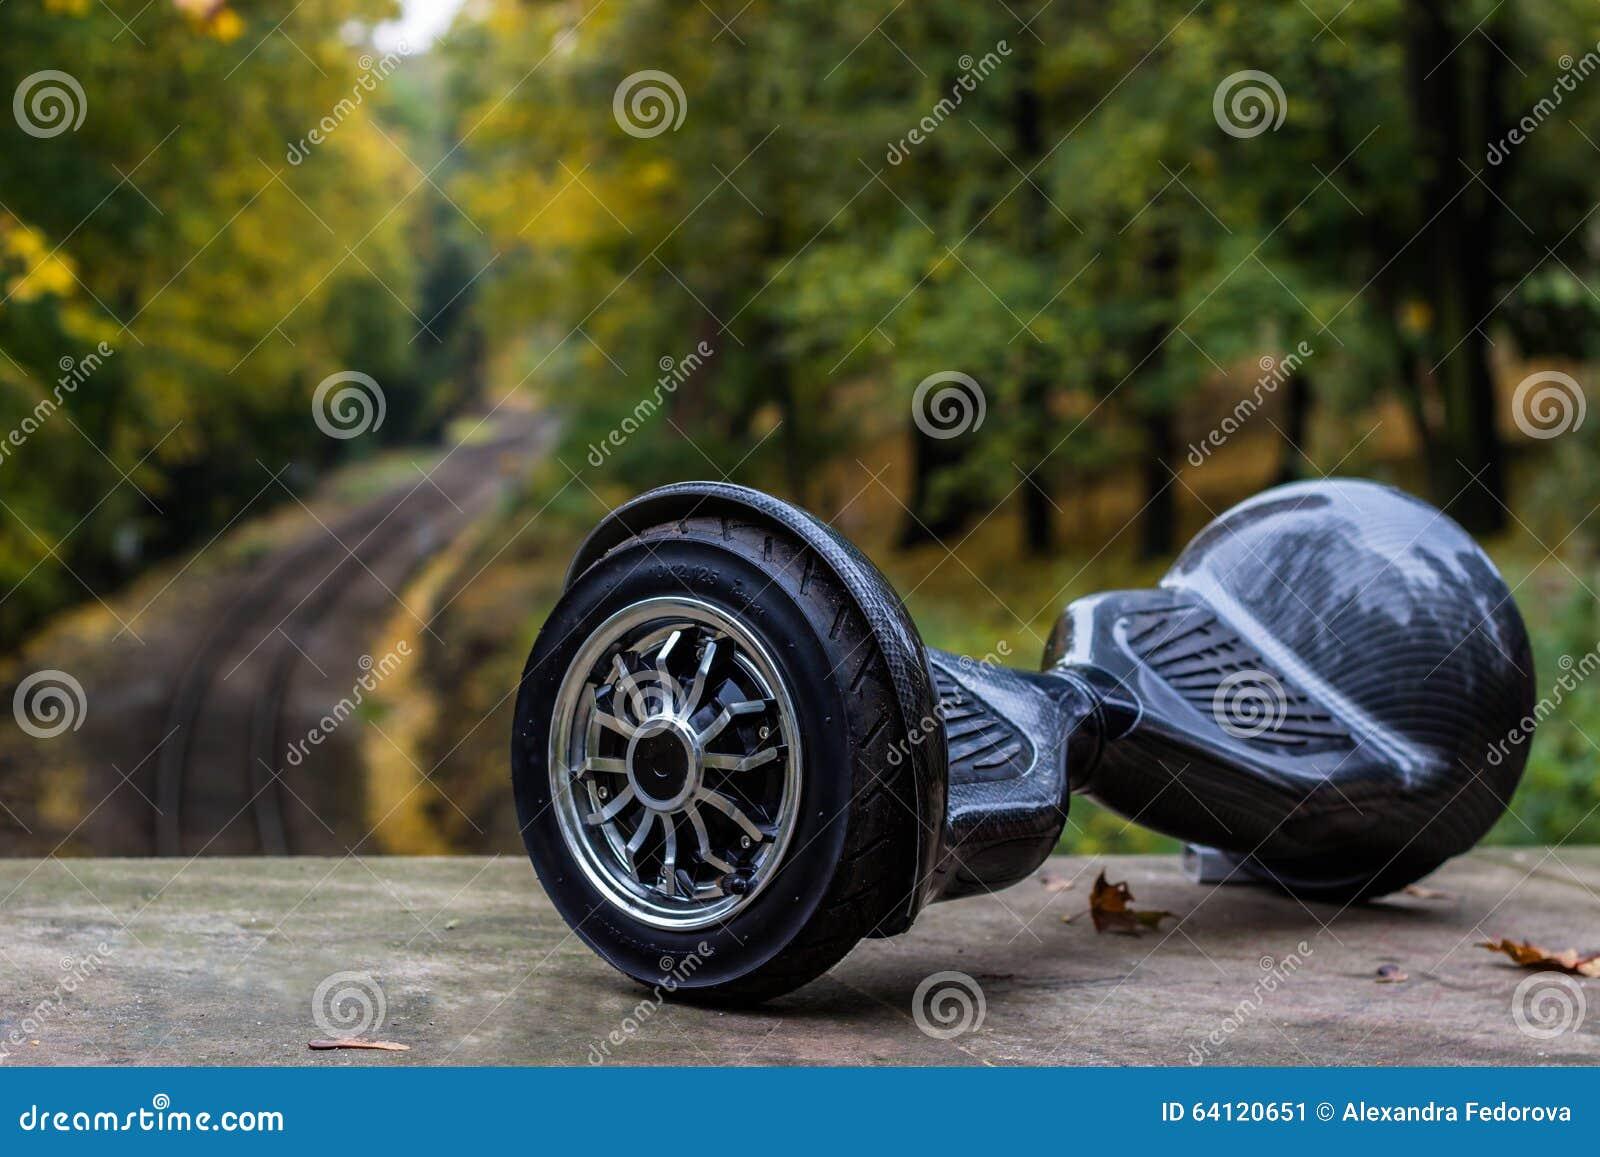 以铁路路轨为背景的黑hoverboard